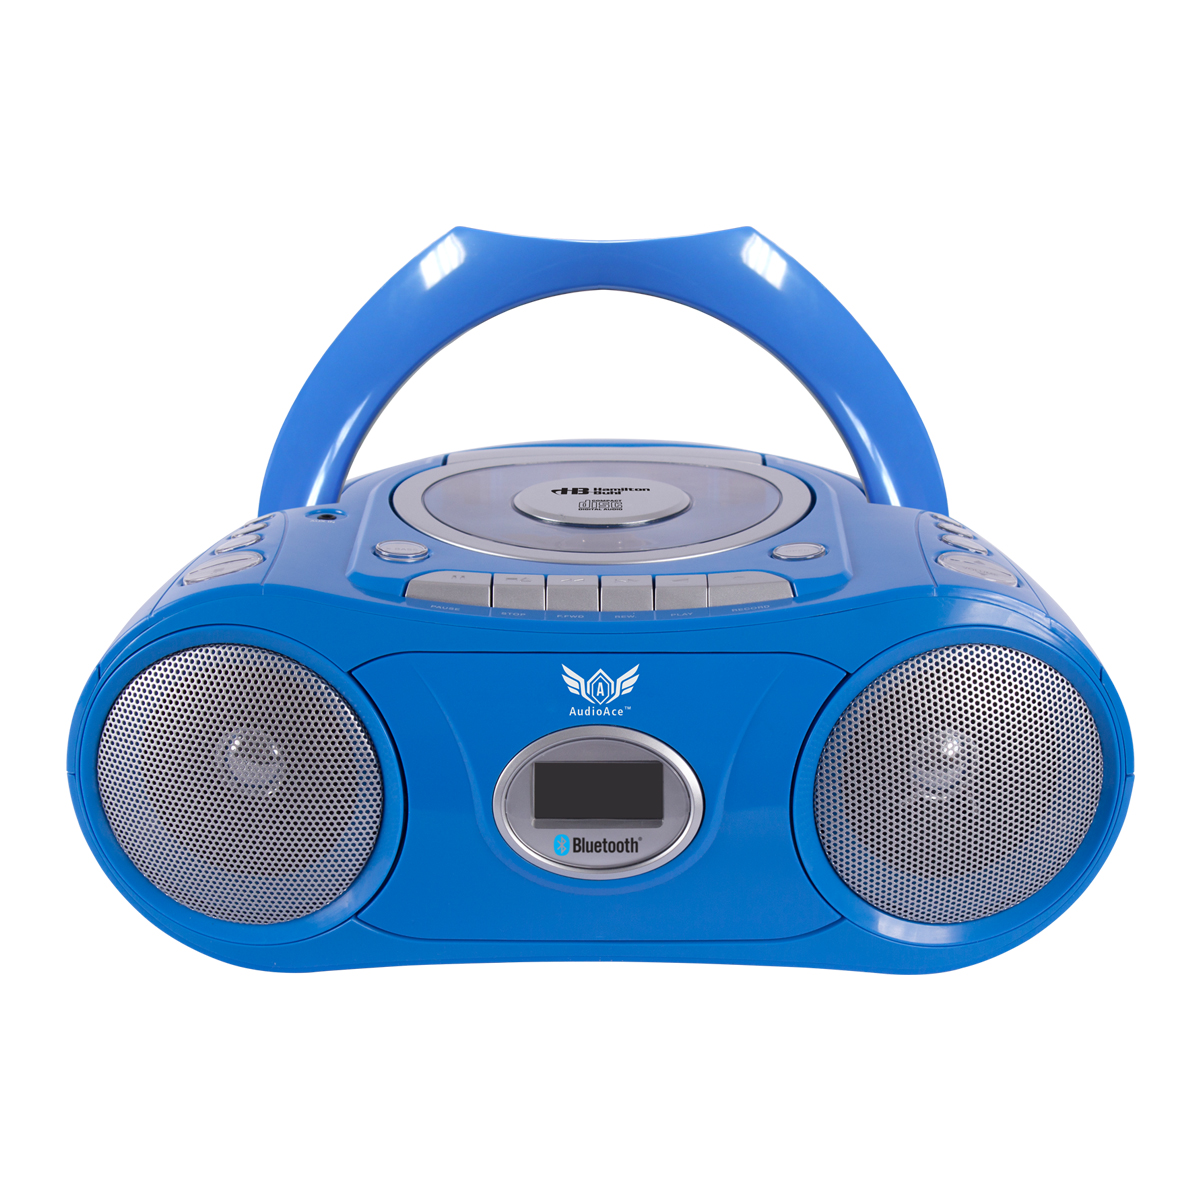 HamiltonBuhl Bluetooth, CD, Cassette and AM/FM Radio Boom Box